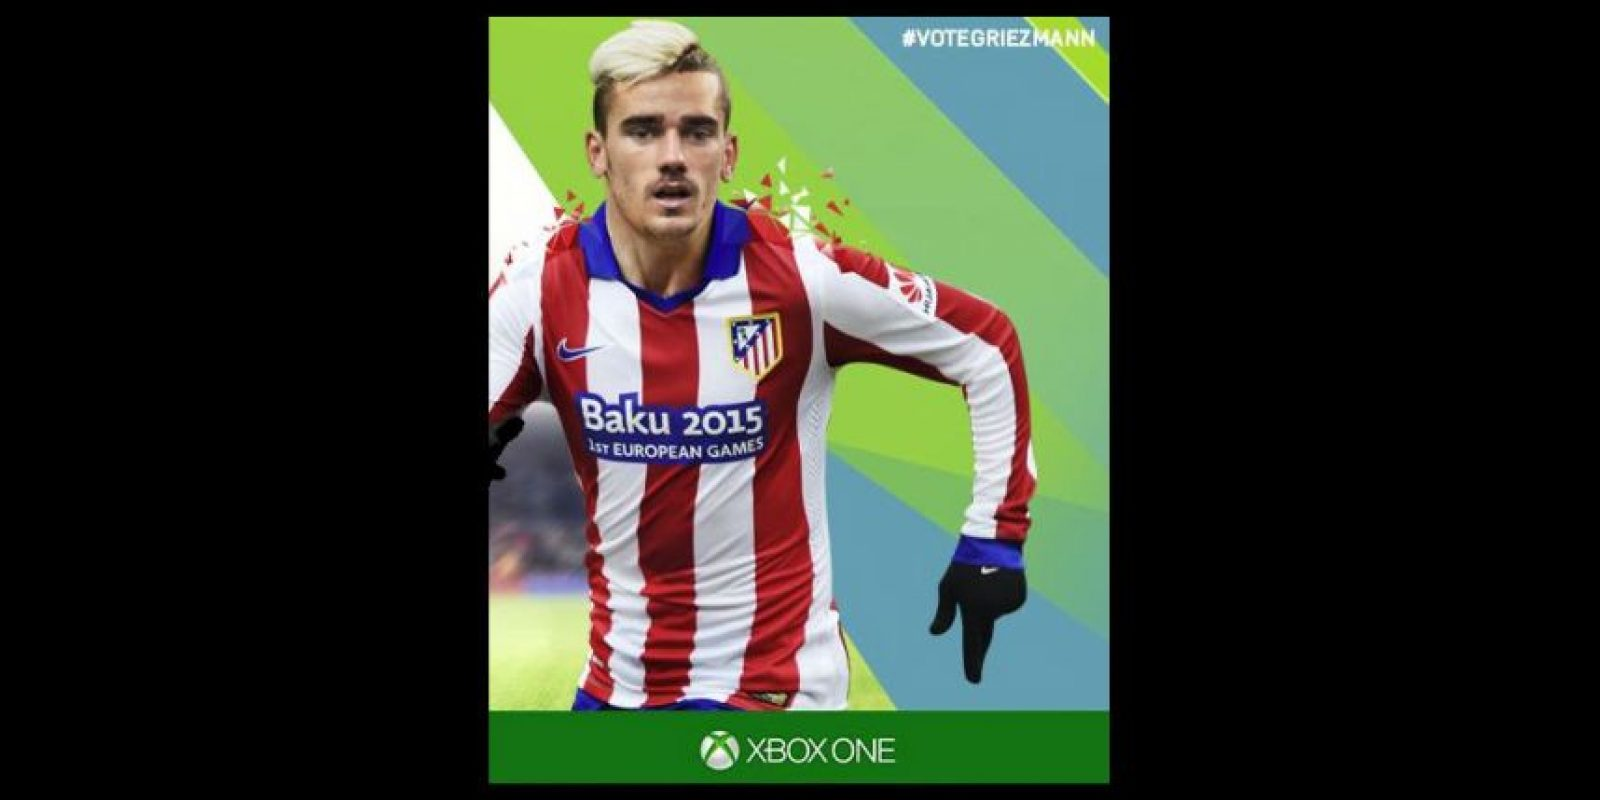 Griezmann es el goleador del club español Atlético de Madrid Foto:twitter.com/Atleticoaldia